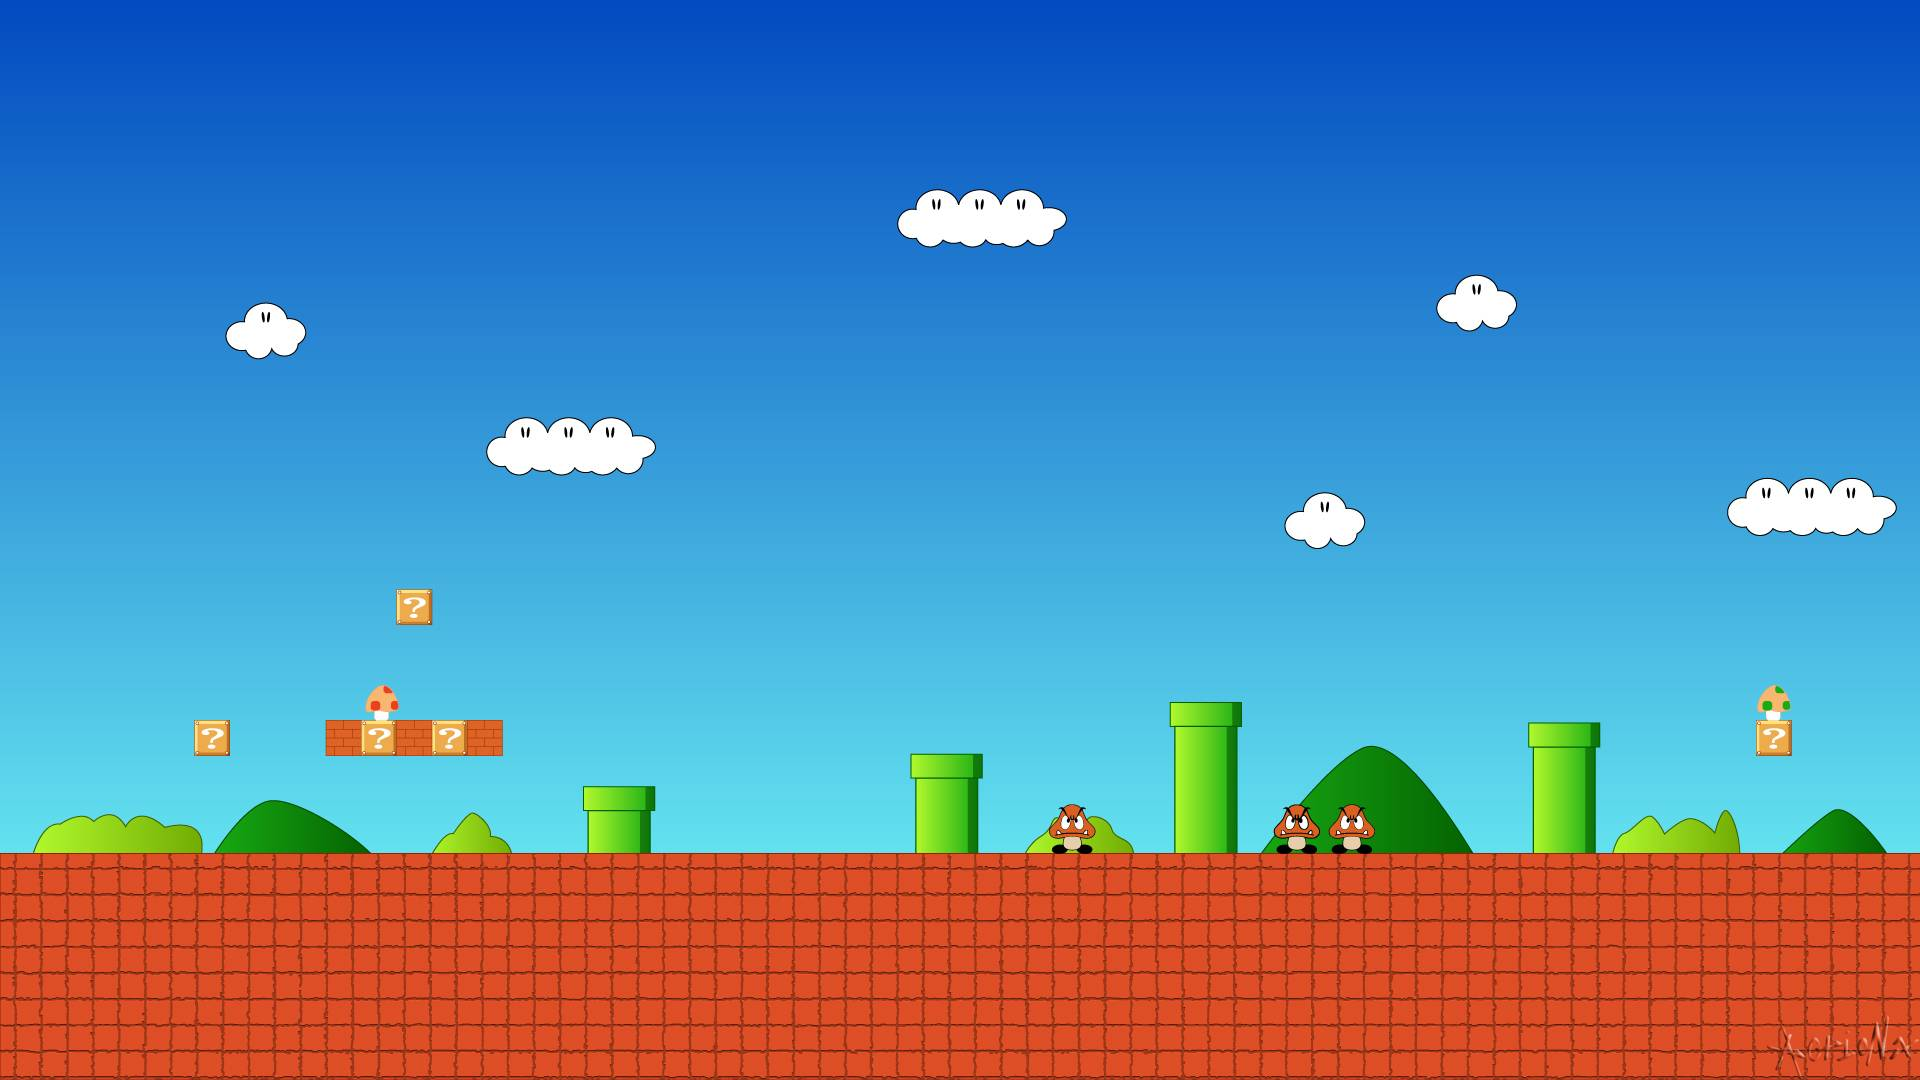 Games Wallpaper: Super Mario Wallpaper 8 Bit Wallpaper Wide with .